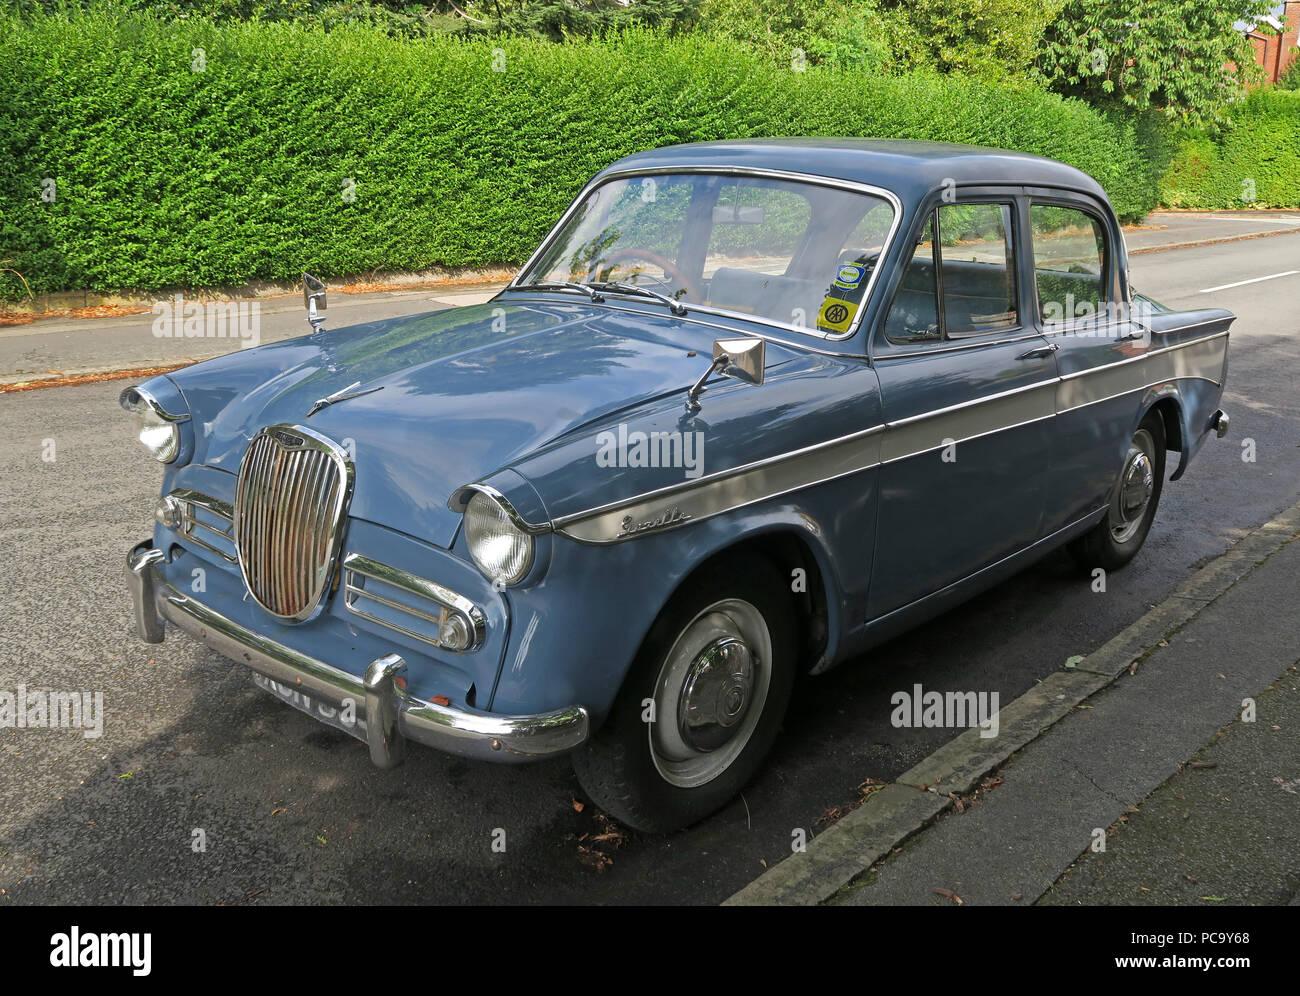 GoTonySmith,@HotpixUK,vehicle,transport,1960,1960s,blue,XJN534,in